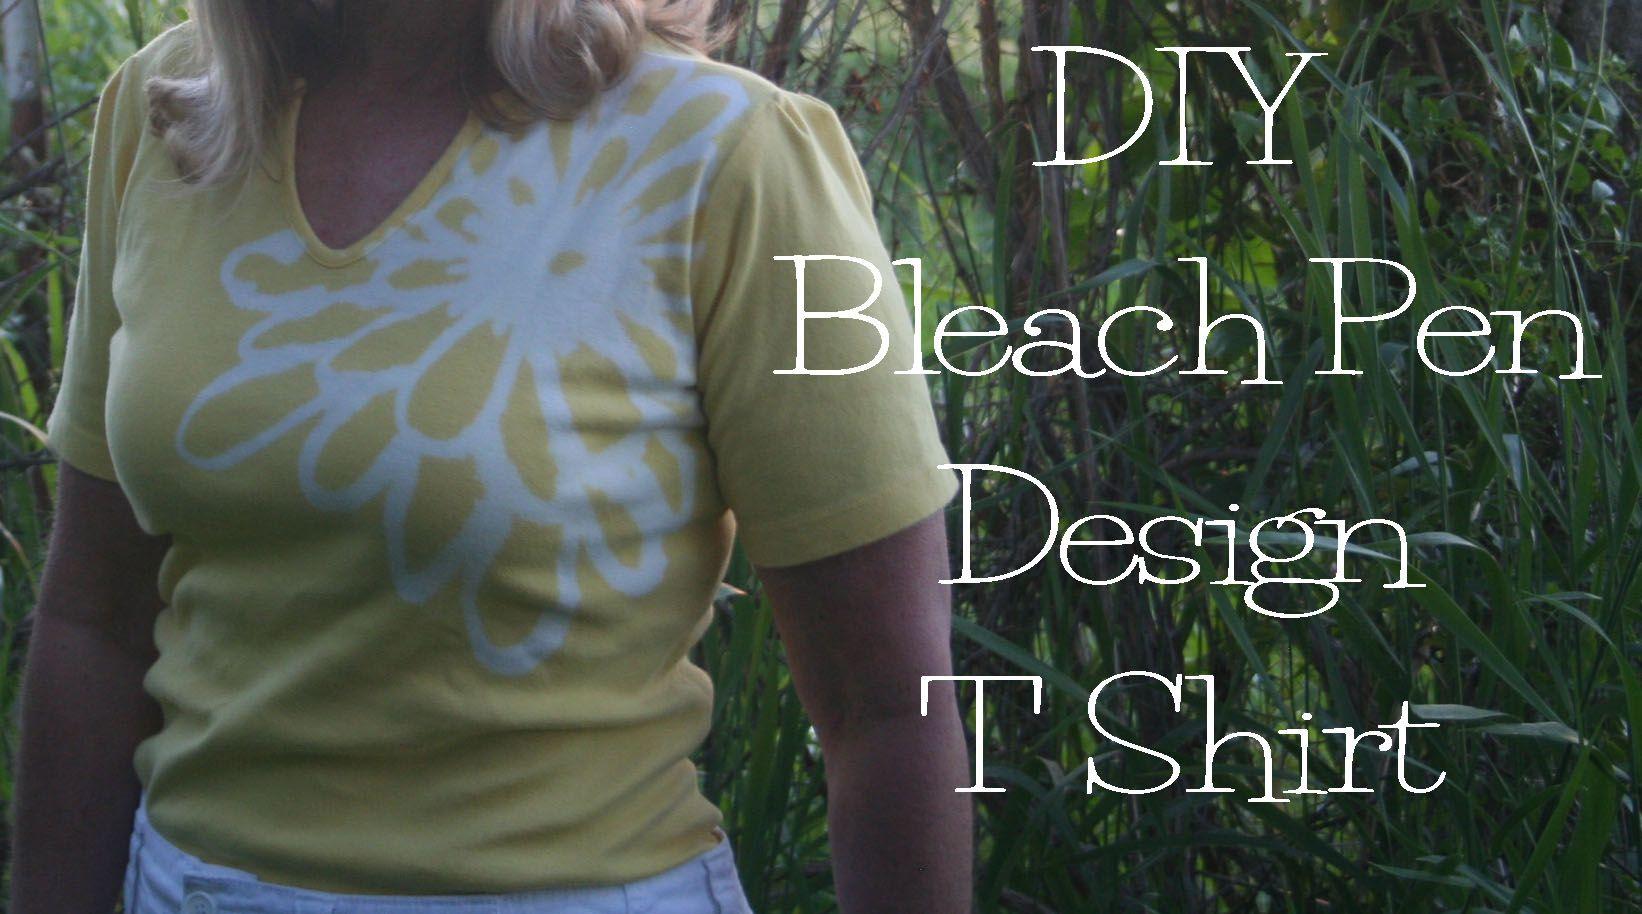 DIY Bleach Pen T Shirt Design | The Renegade Seamstress